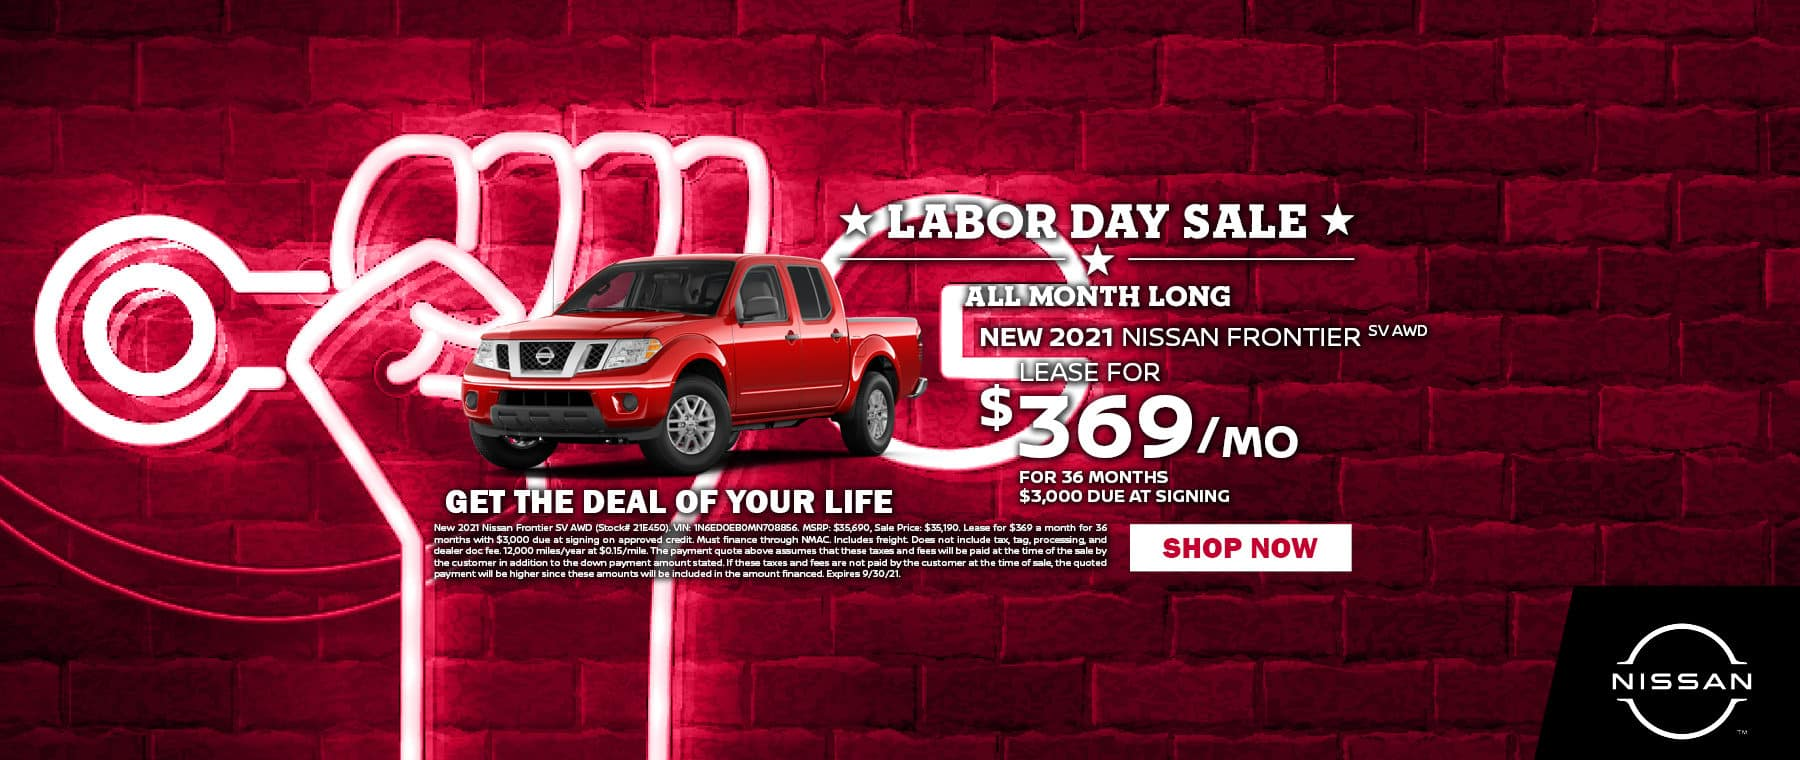 Nissan_LaborDayBannersWithOffers_246084